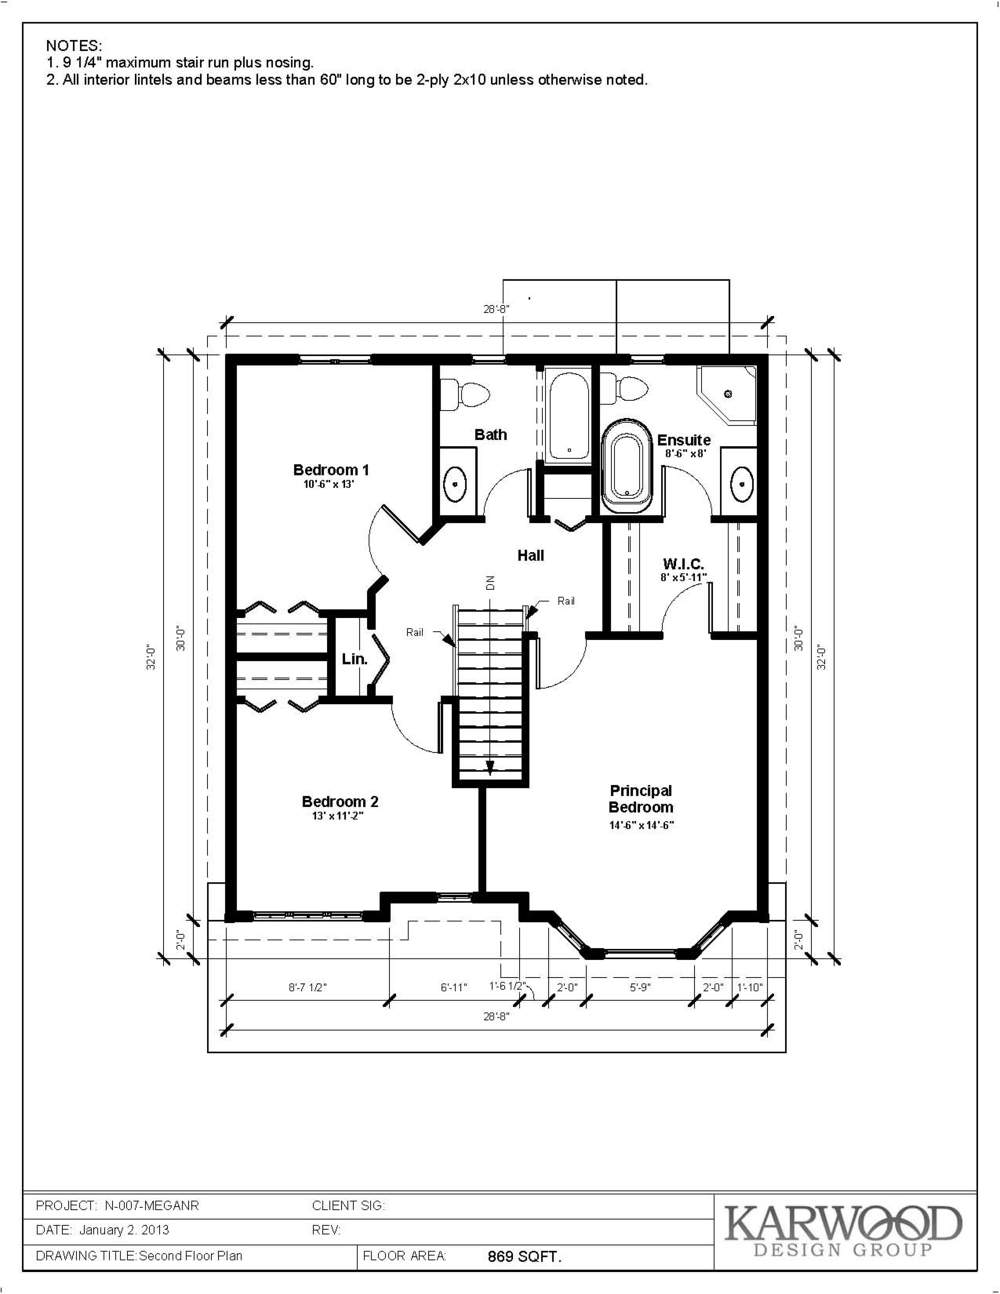 N-007-MEGANR (listing)_Page_4.jpg